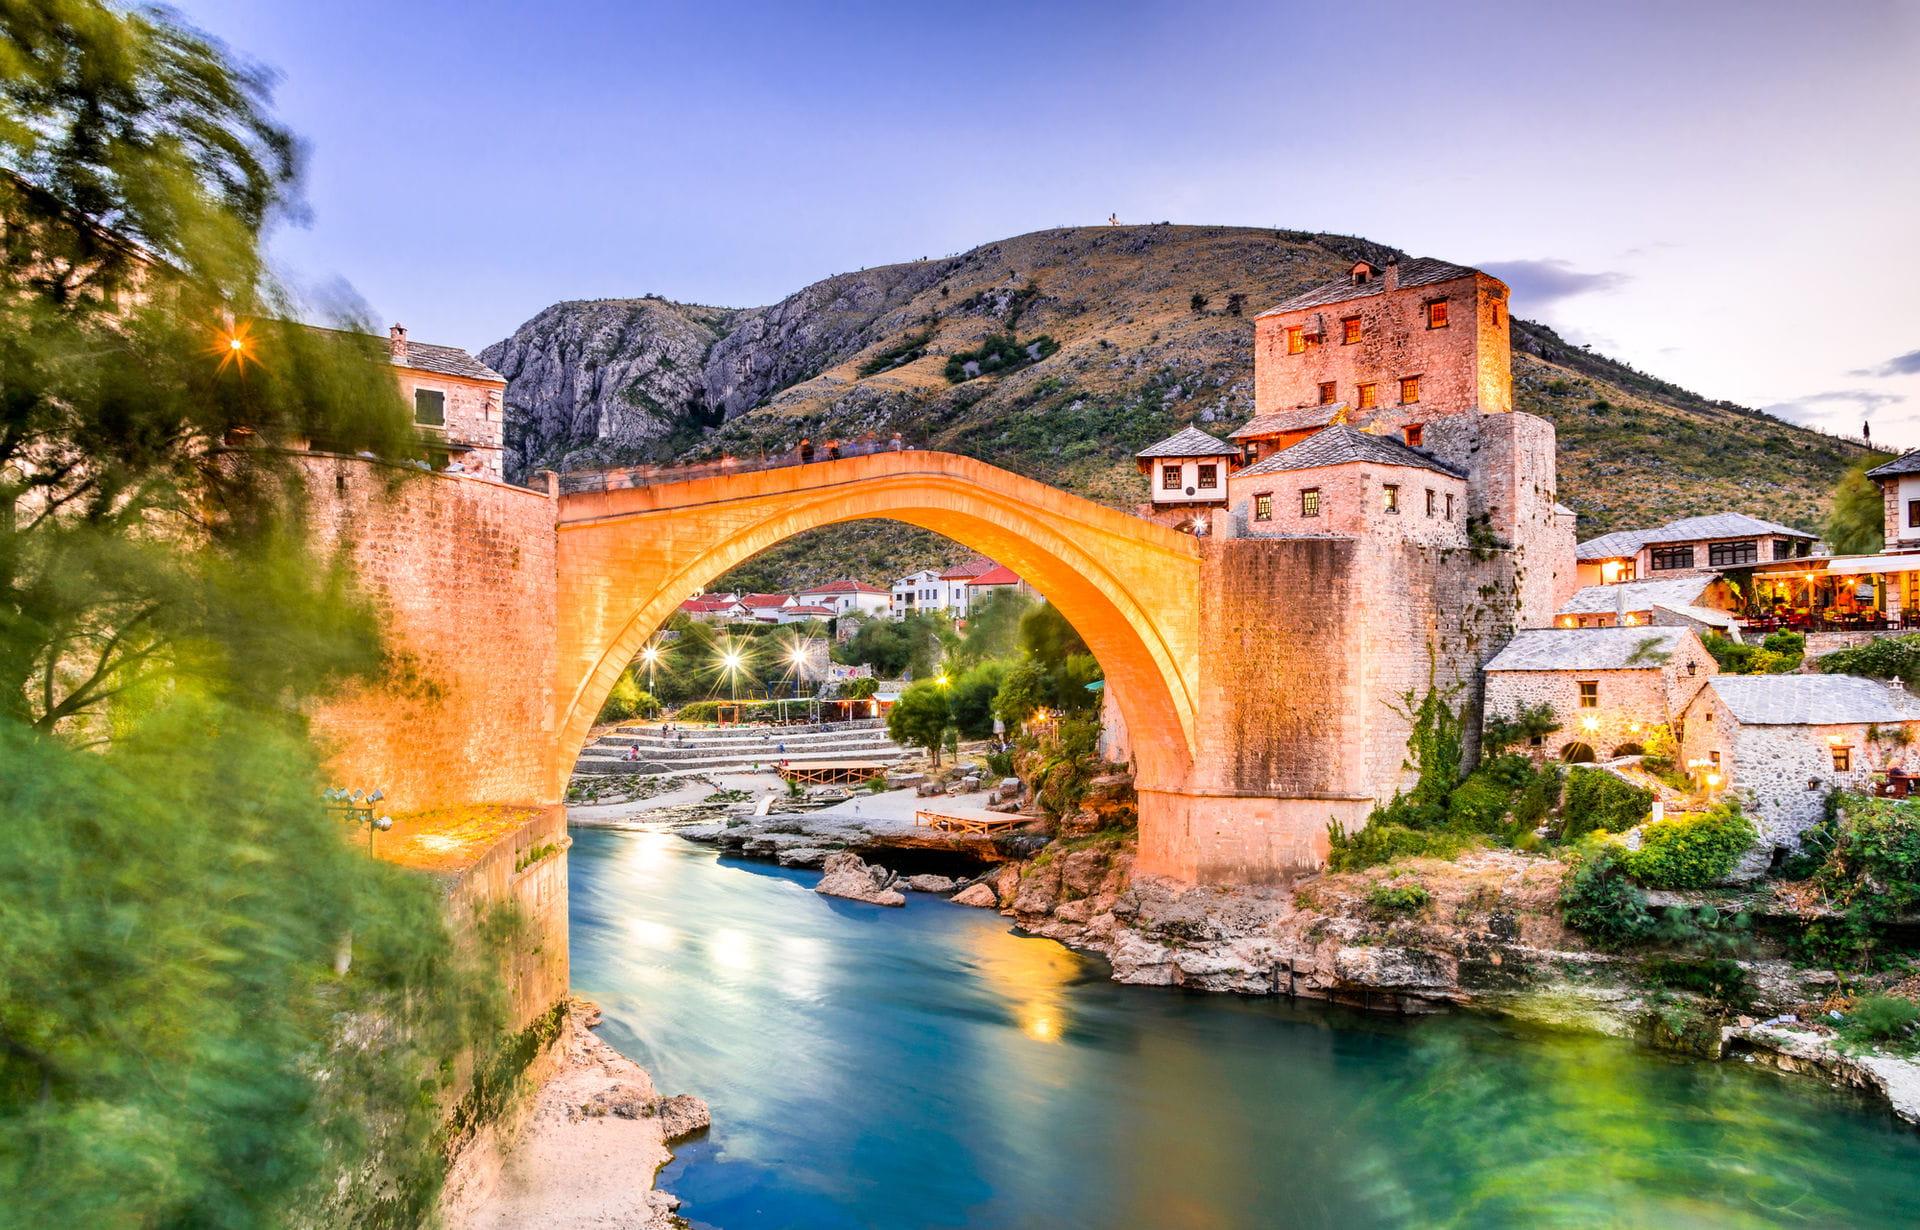 High quality hoto of Mostar - Bosnia and Herzegovina